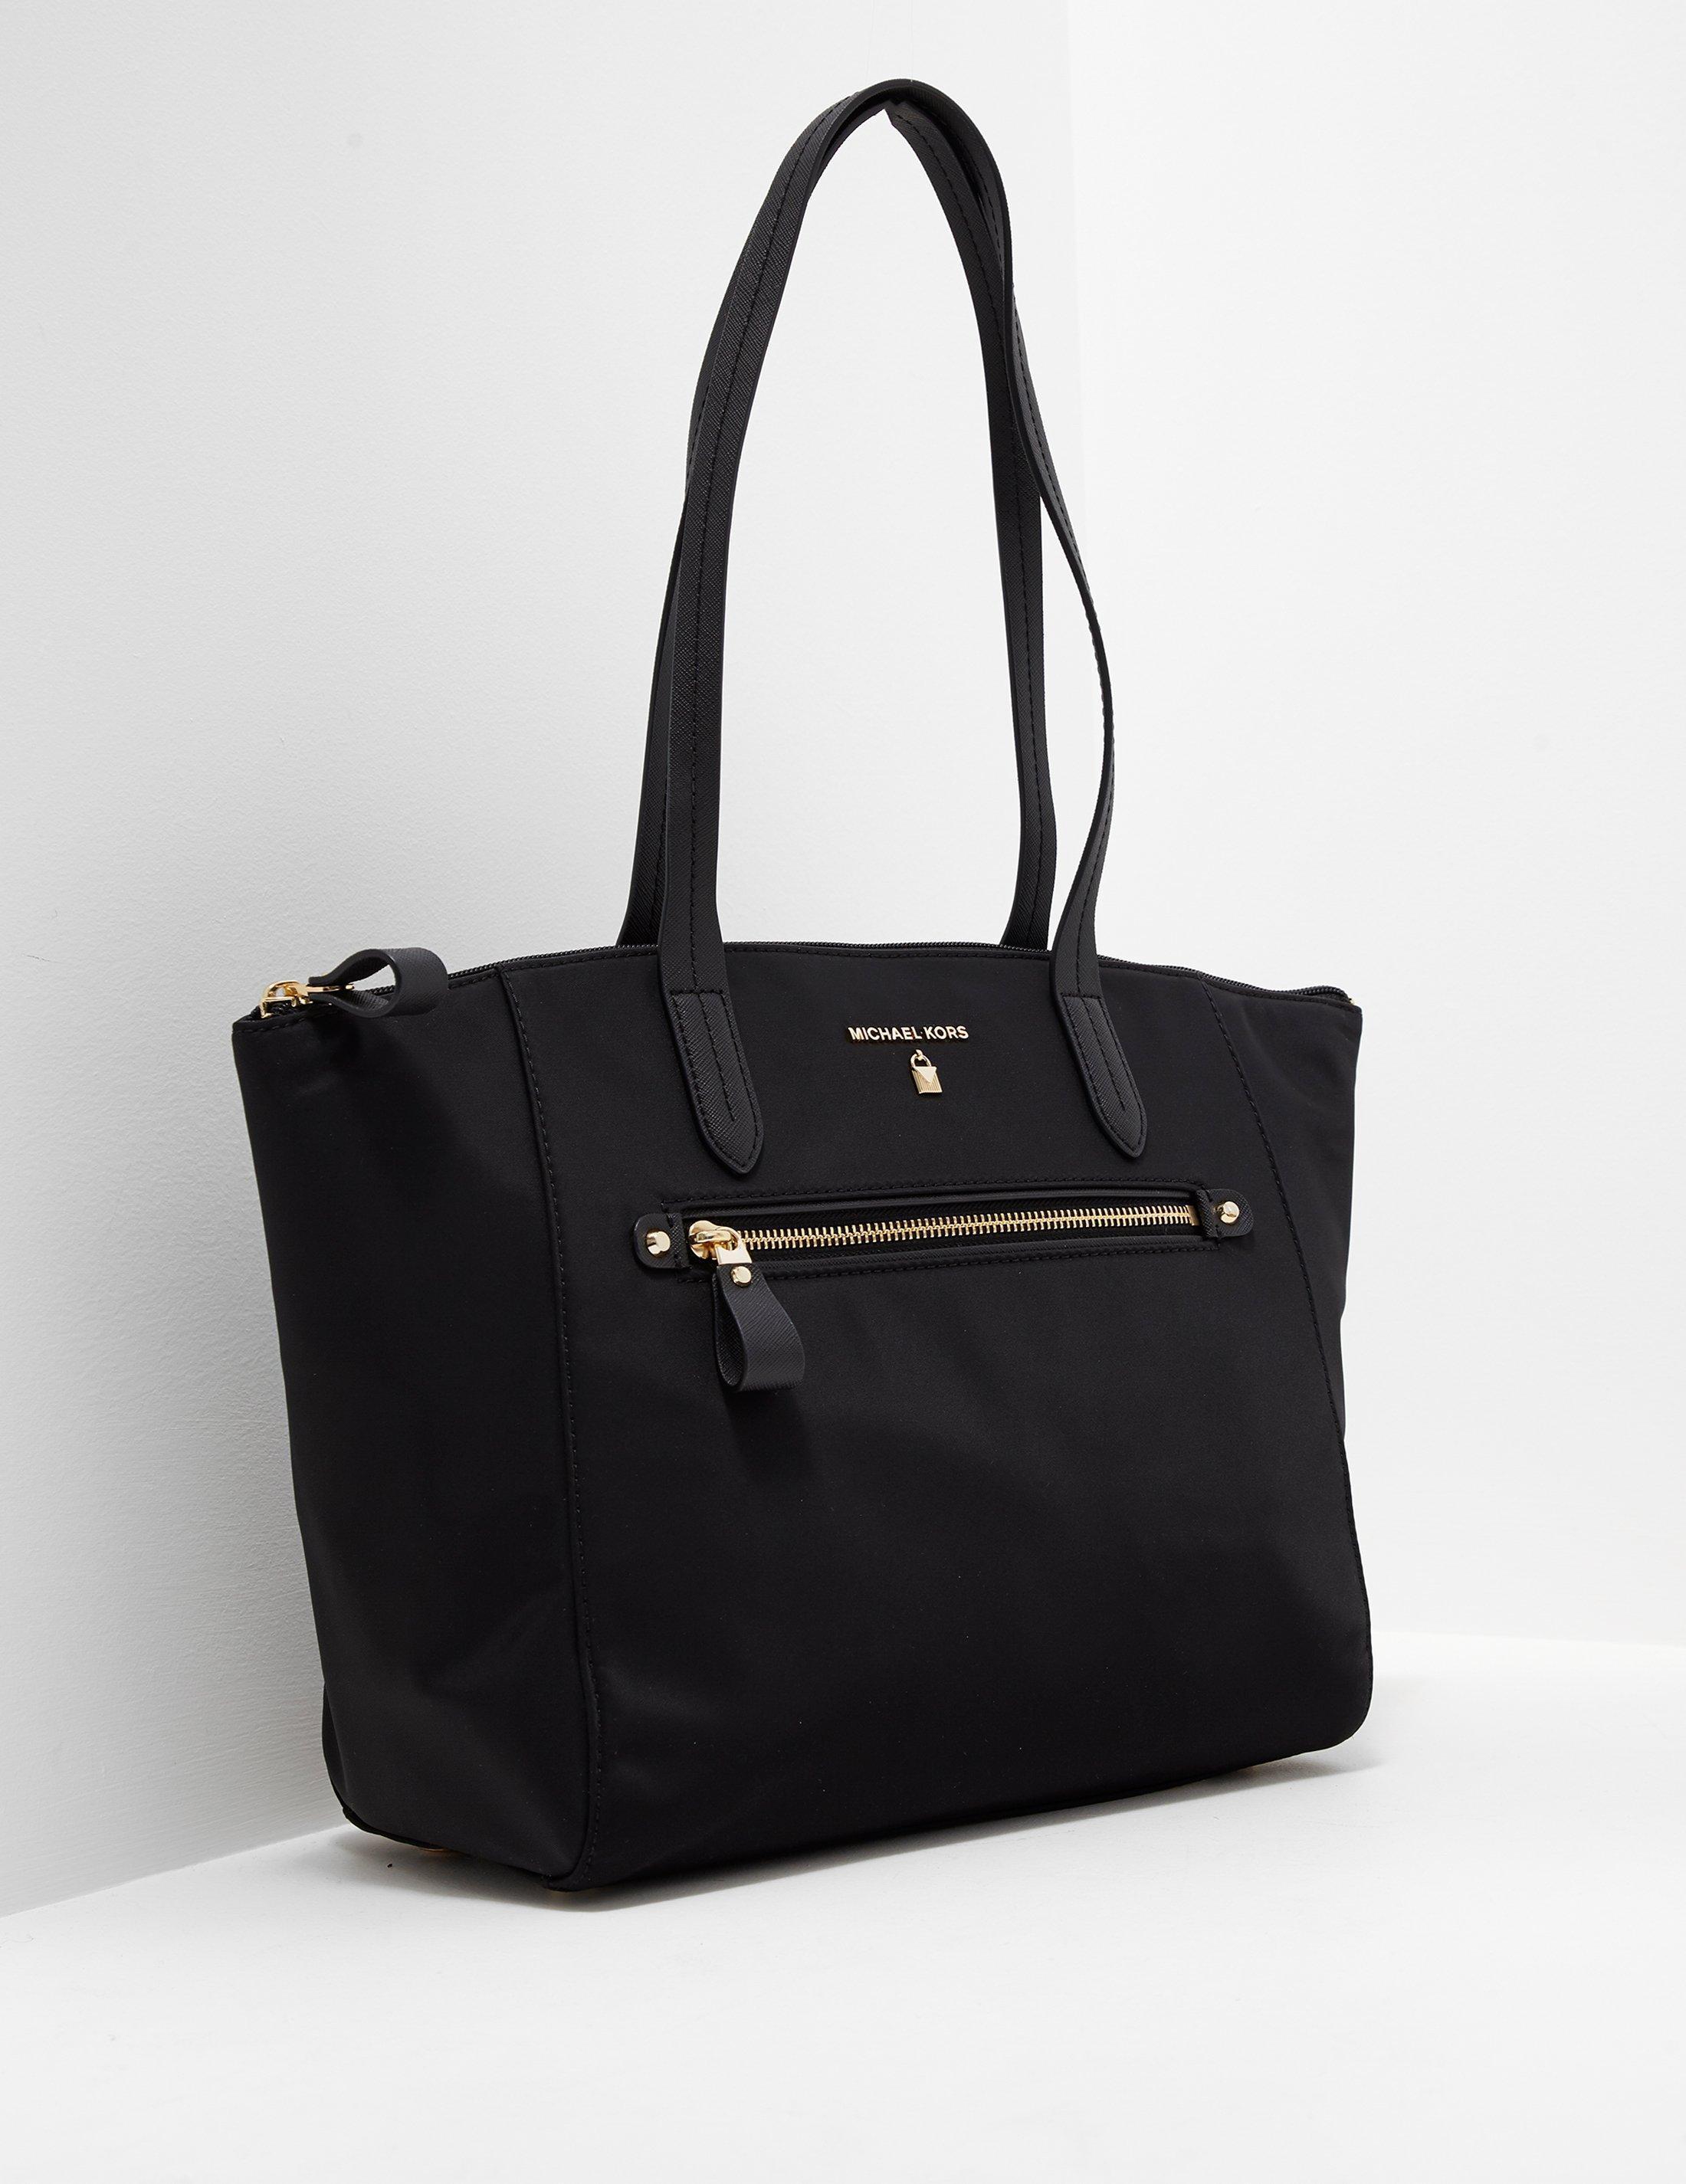 0c7f8cd4f2e Lyst - Michael Kors Nylon Kelsey Tote Bag Black in Black - Save 3%